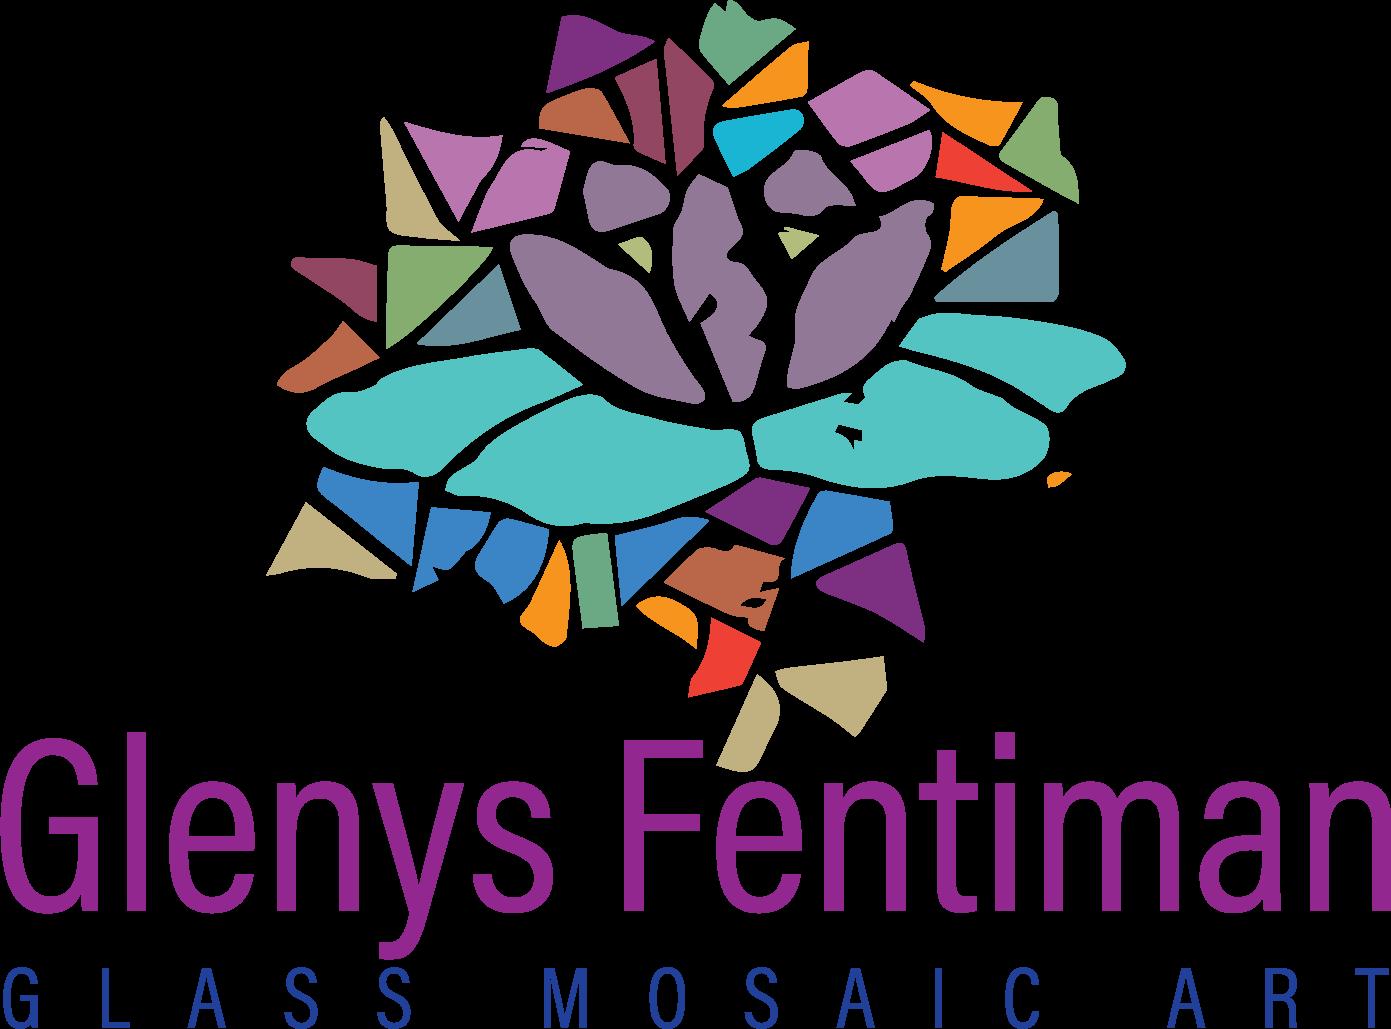 Glenys Fentiman Glass Design